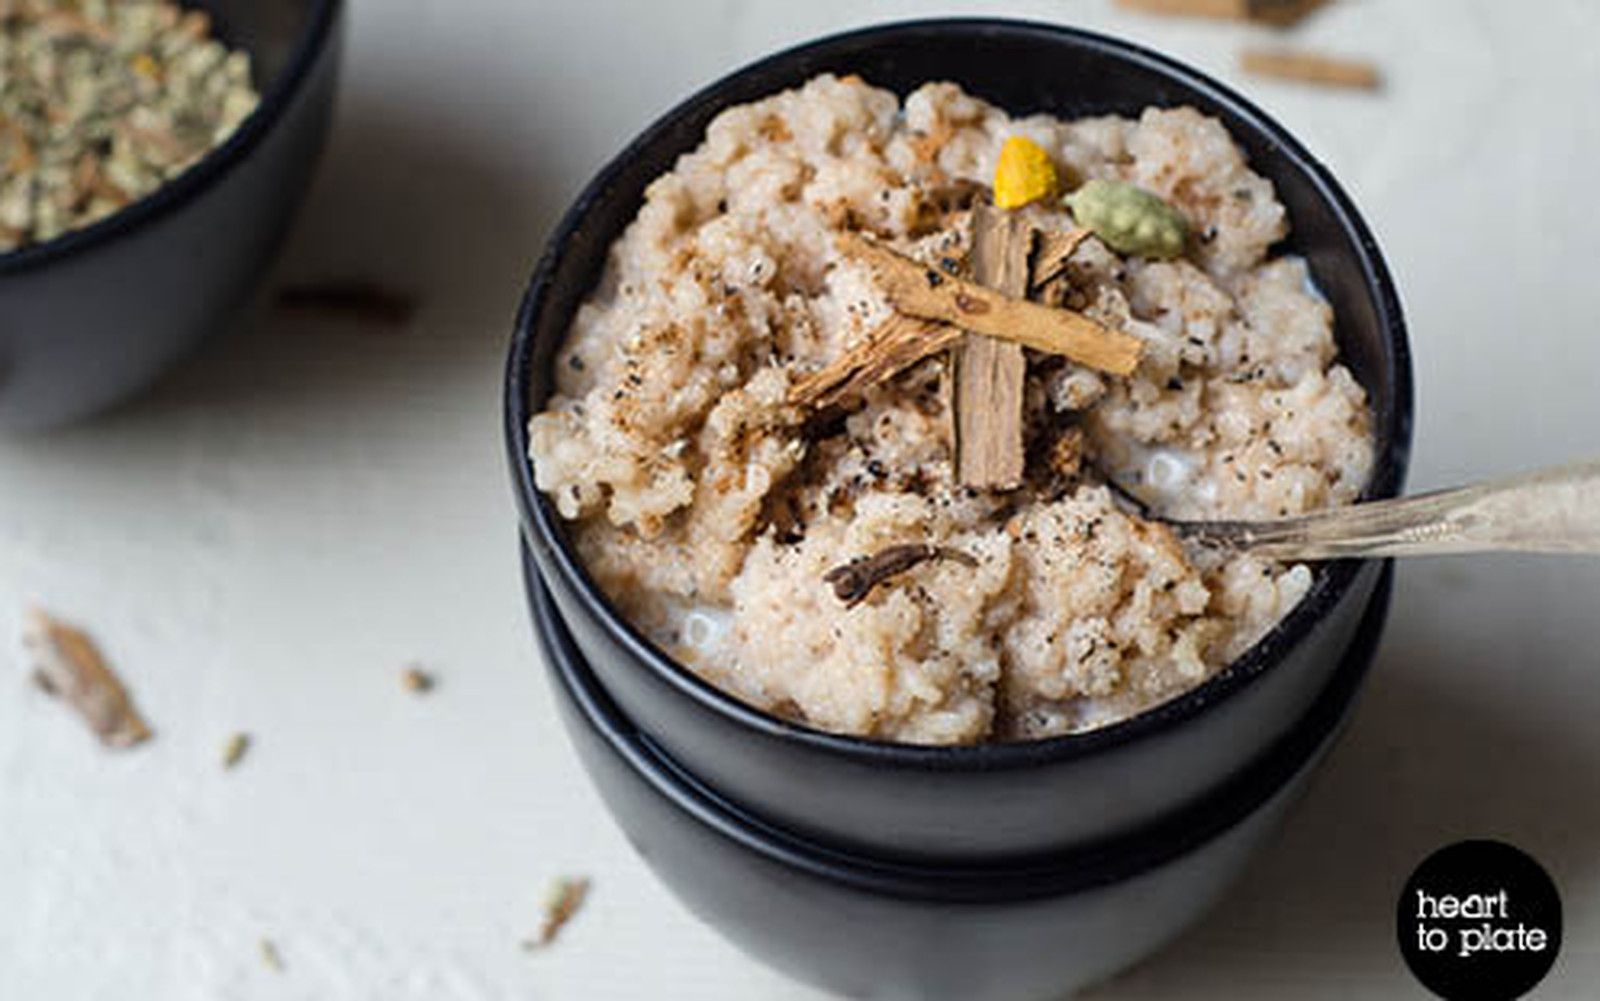 Nepali Rice Pudding [Vegan, Gluten-Free]